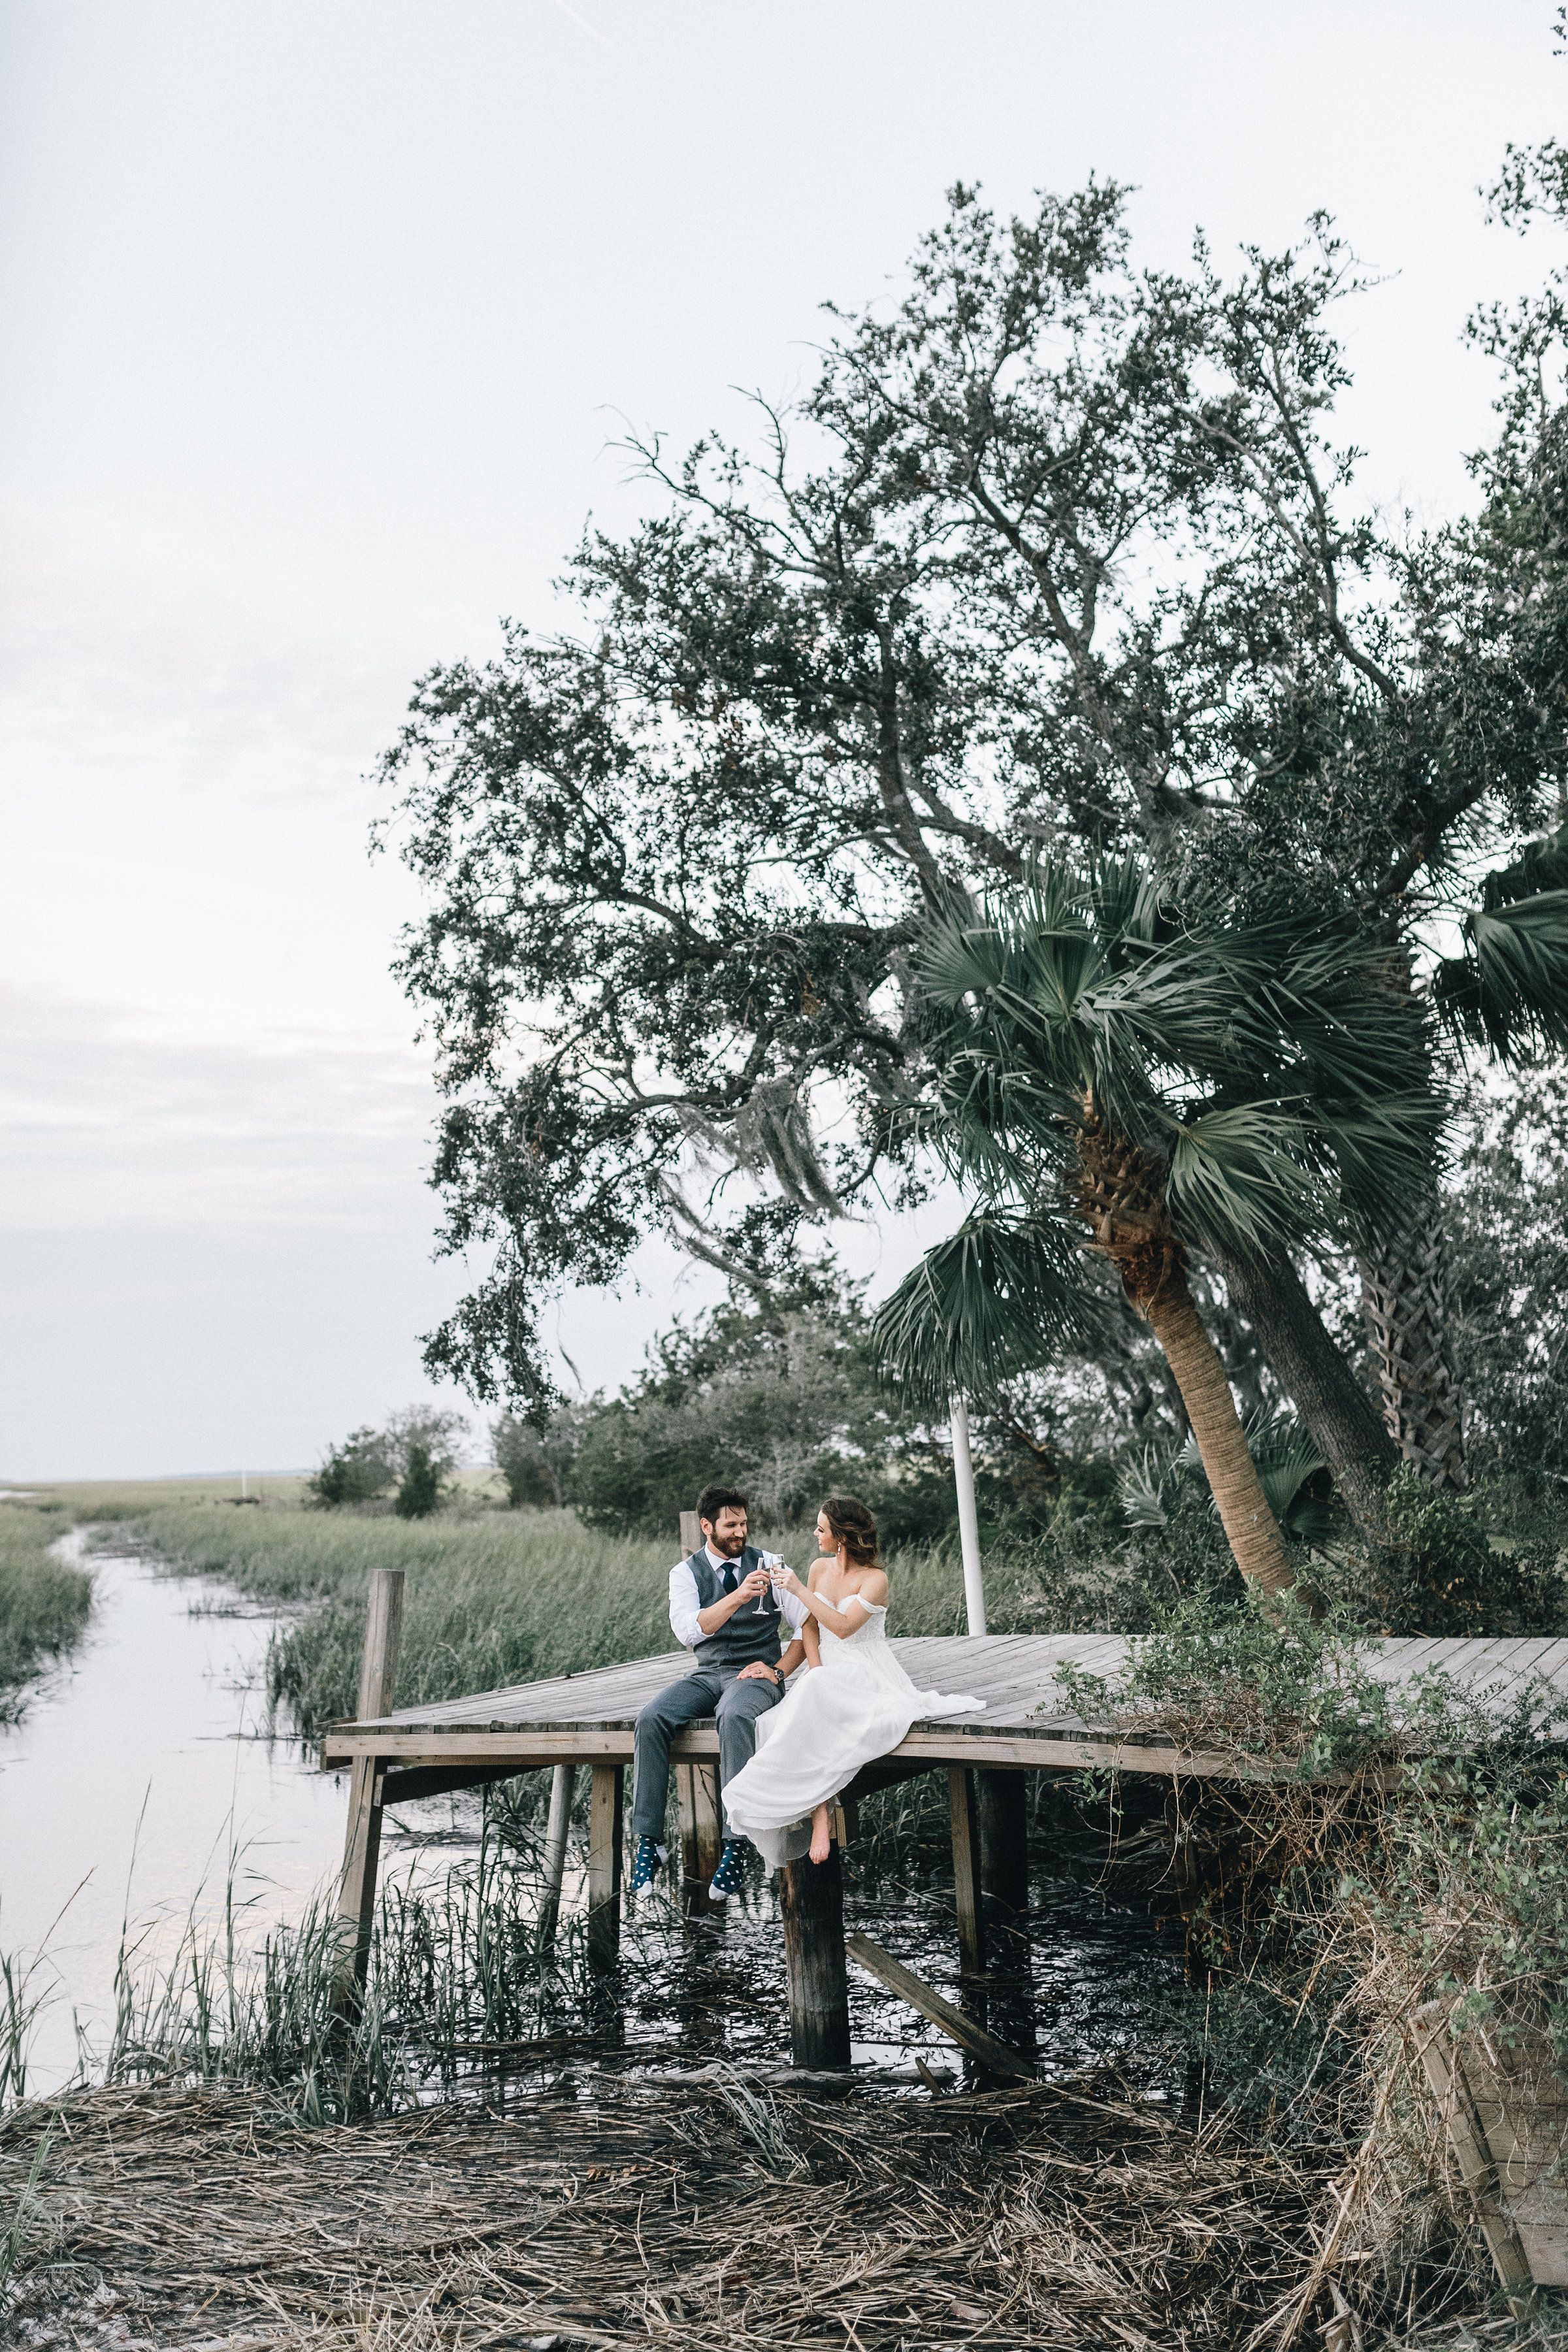 Amy & Timothy's Savannah GA wedding by Mackensey Alexander Photography